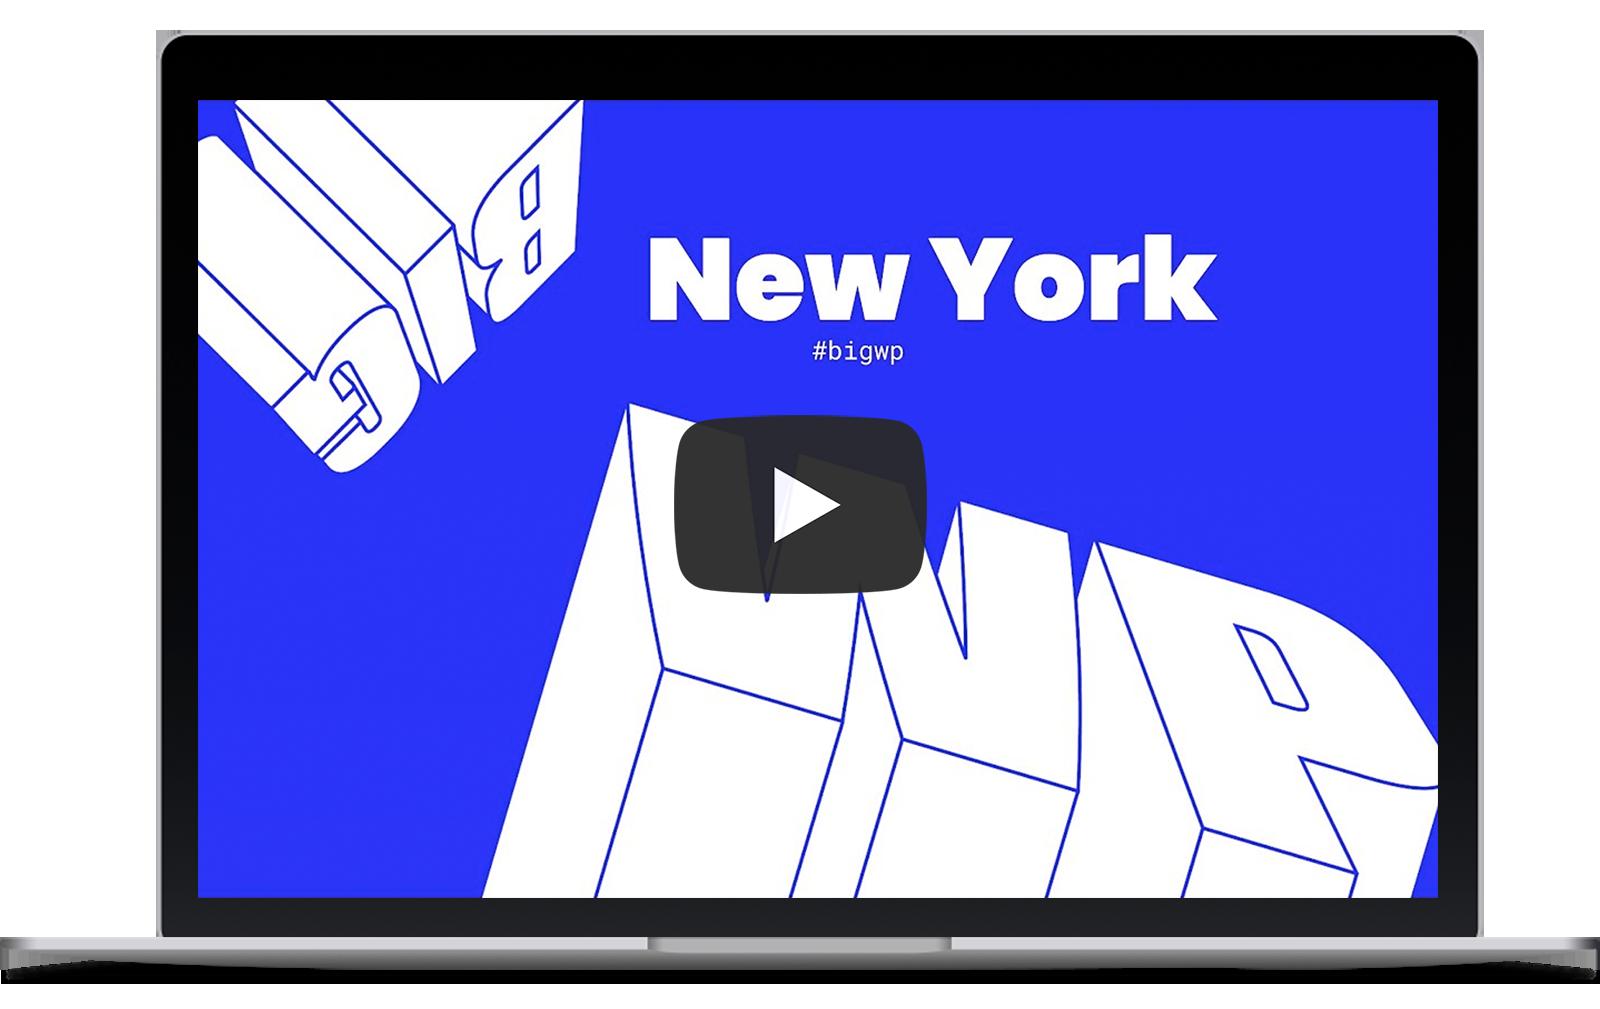 Paul Schreiber BigWP New York